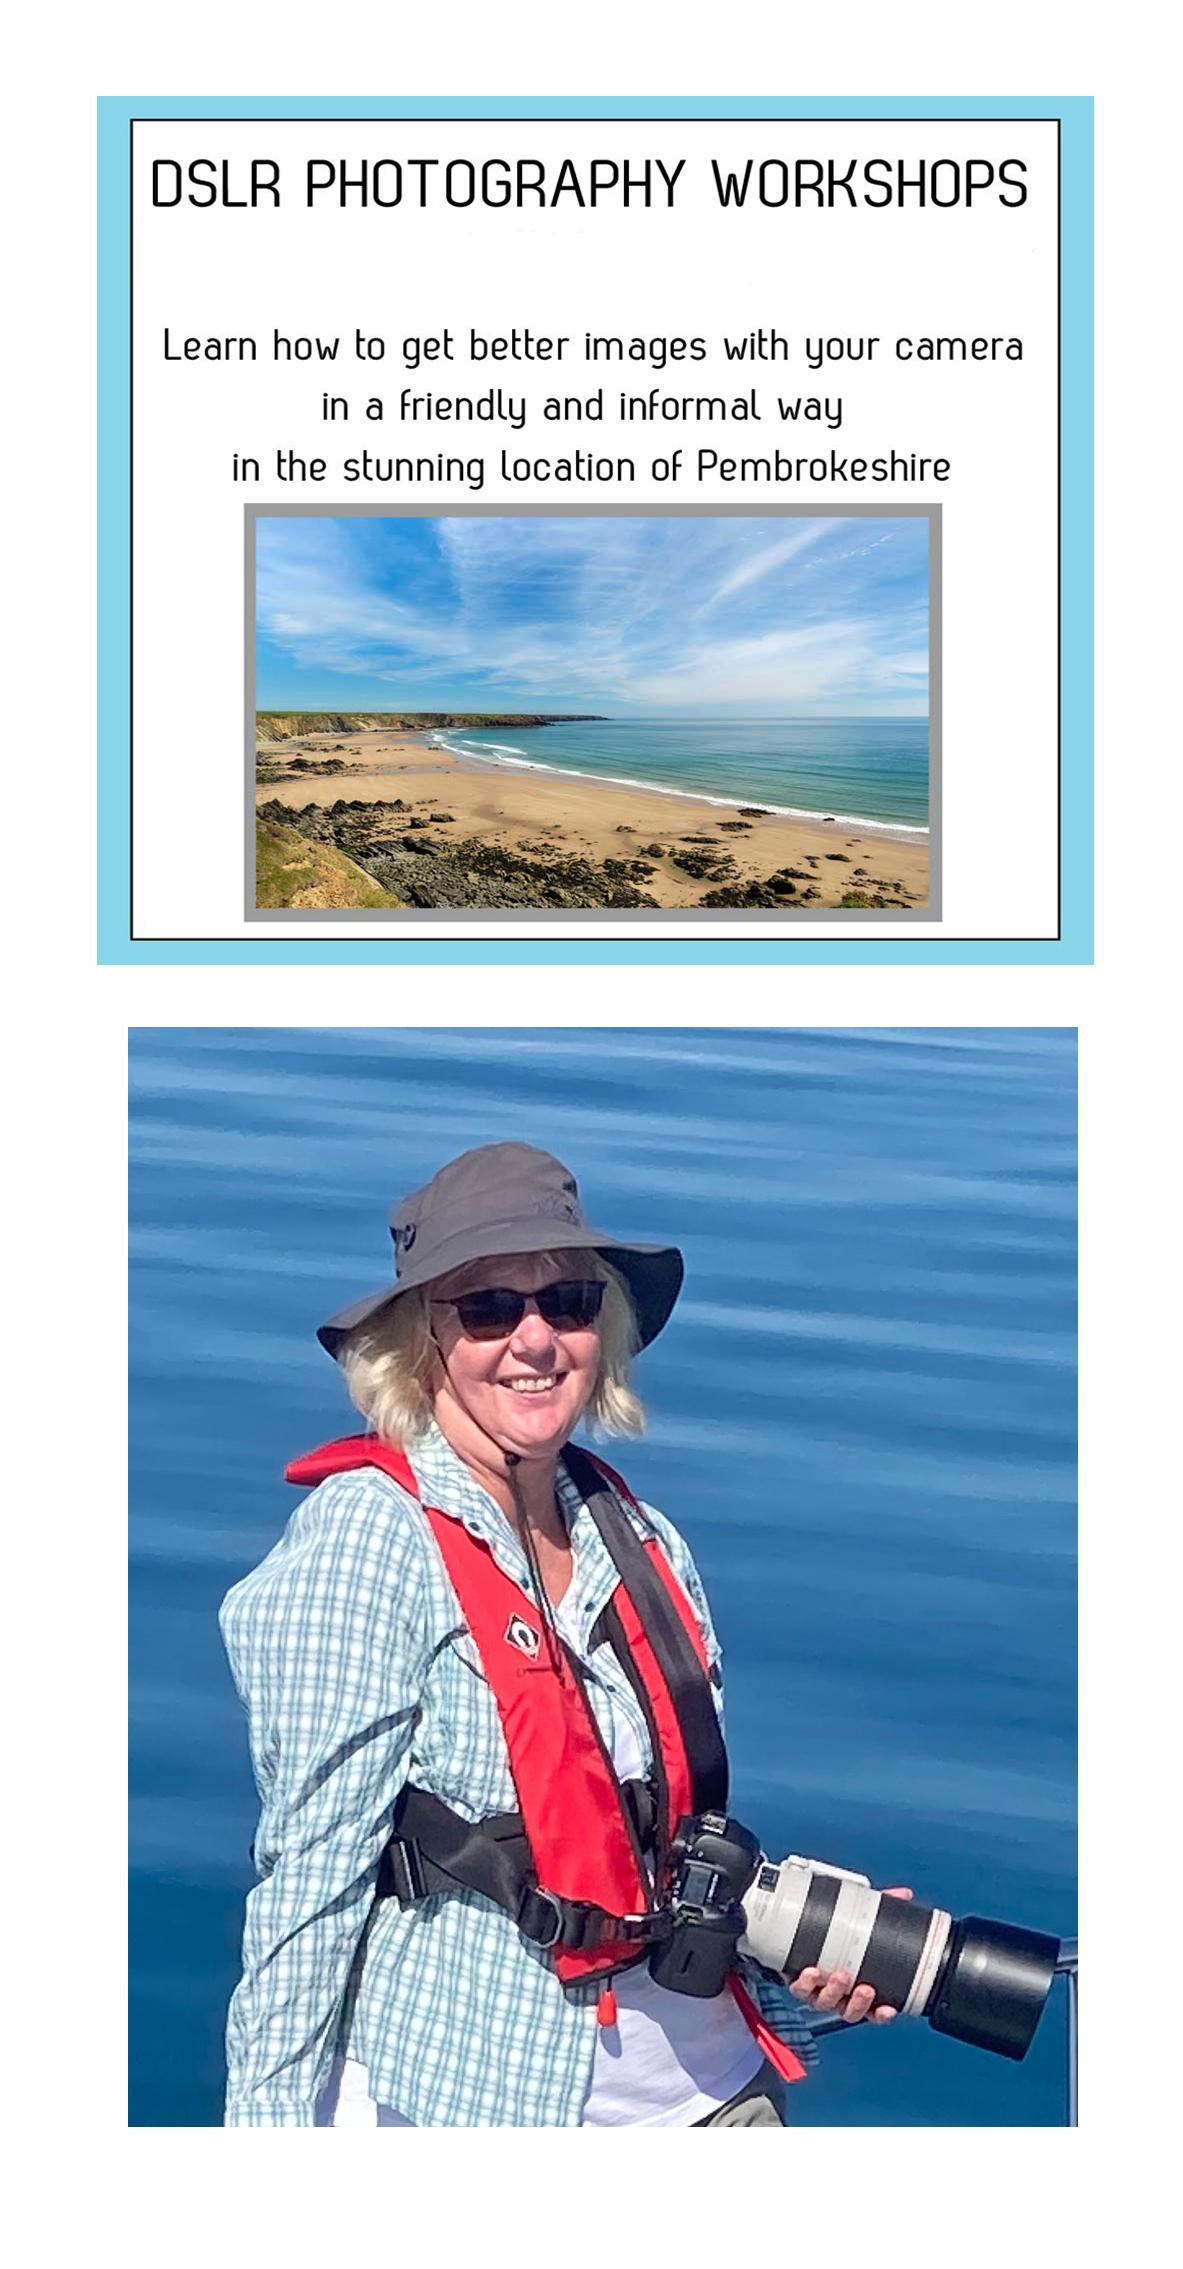 Rachel Mullett of Pembrokeshire moments running landscape photography workshops in pembrokeshire